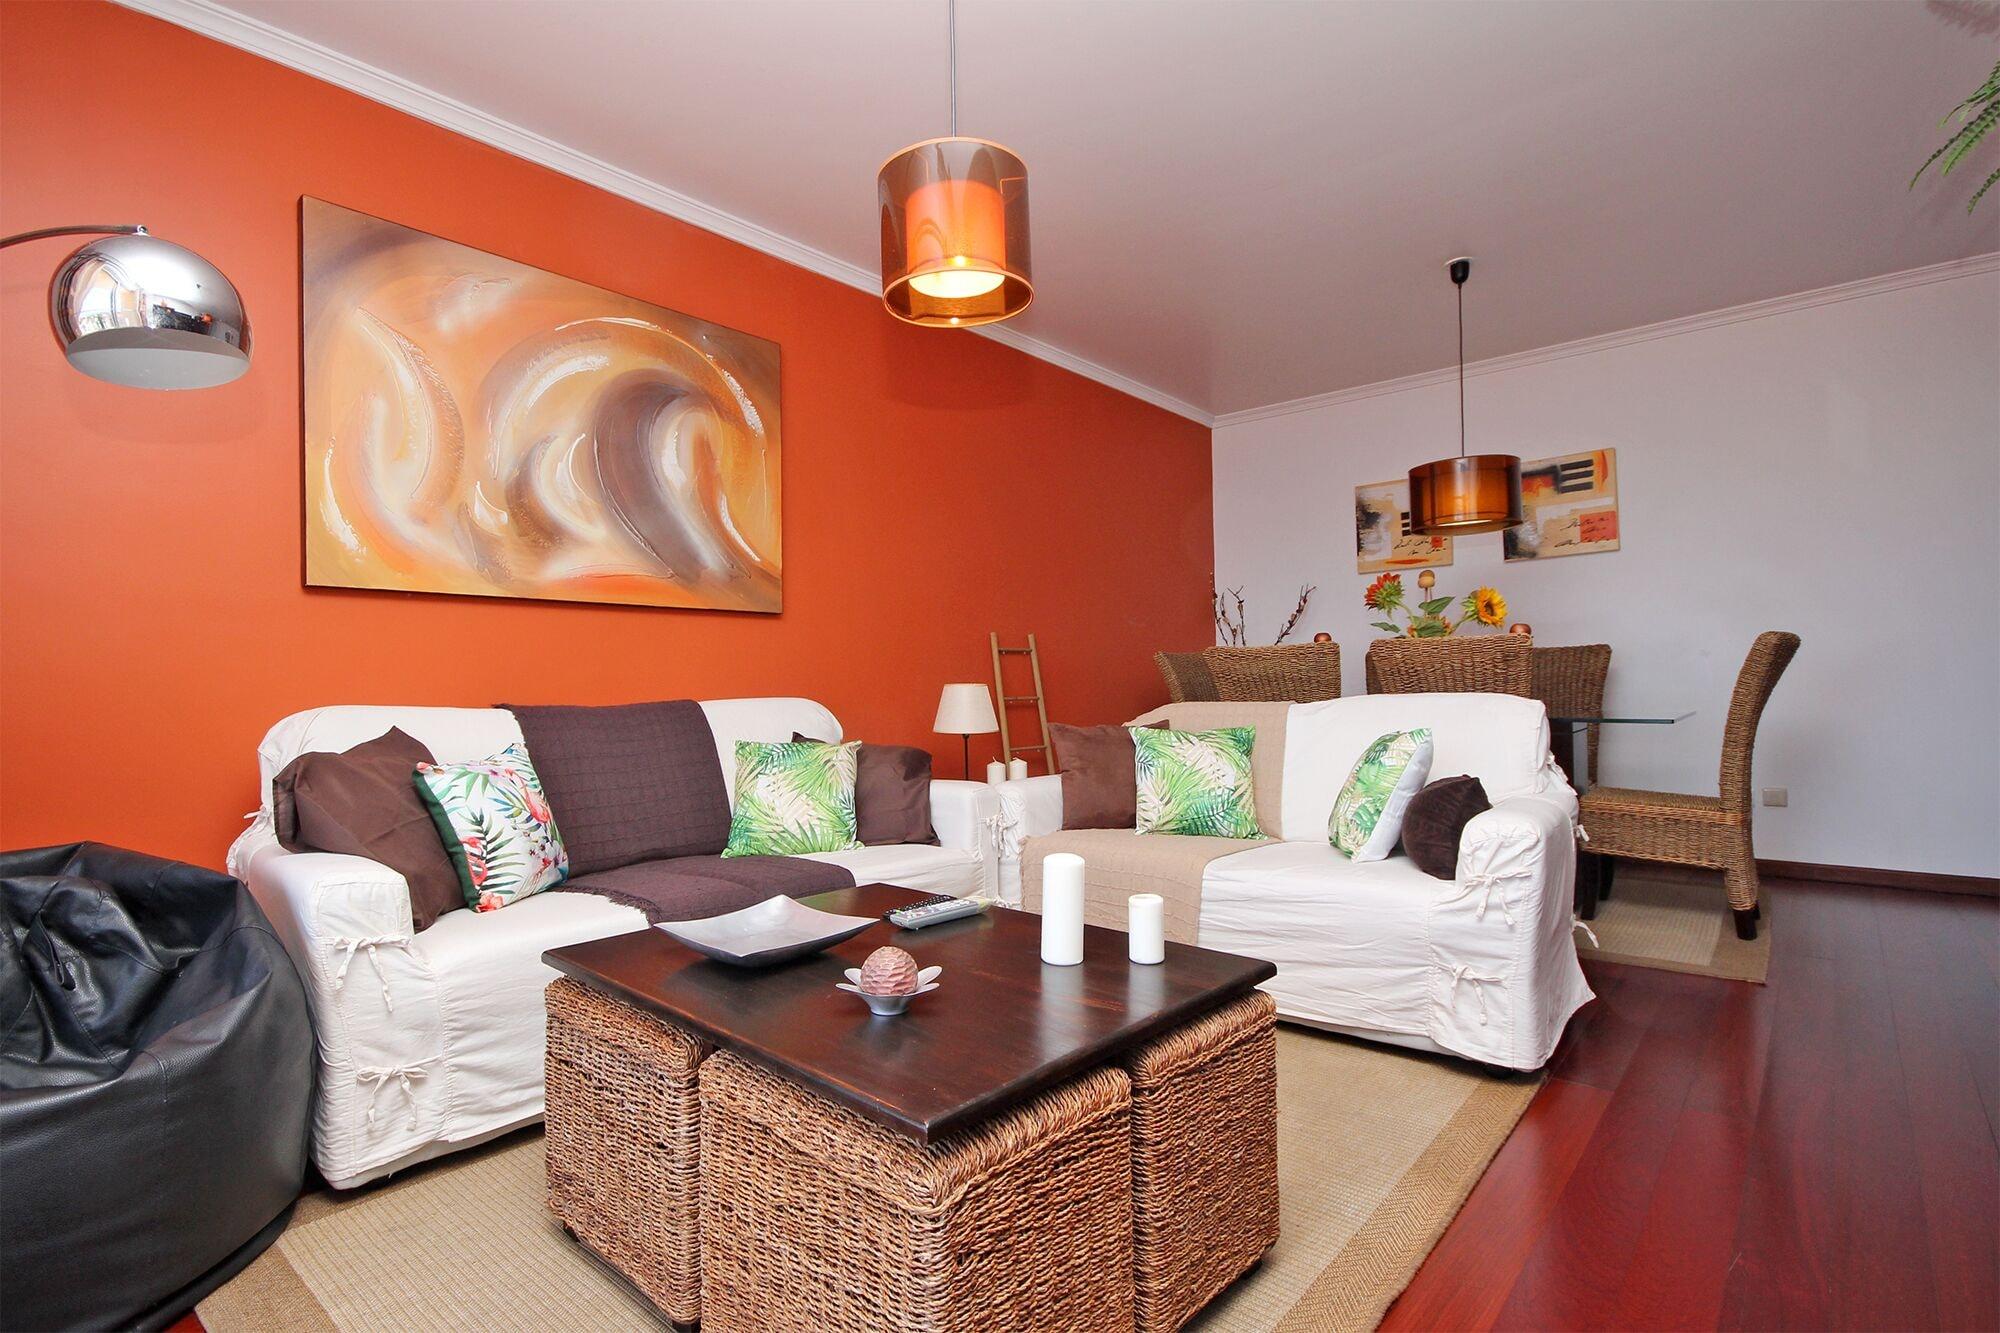 Barcelos Apartment, Funchal